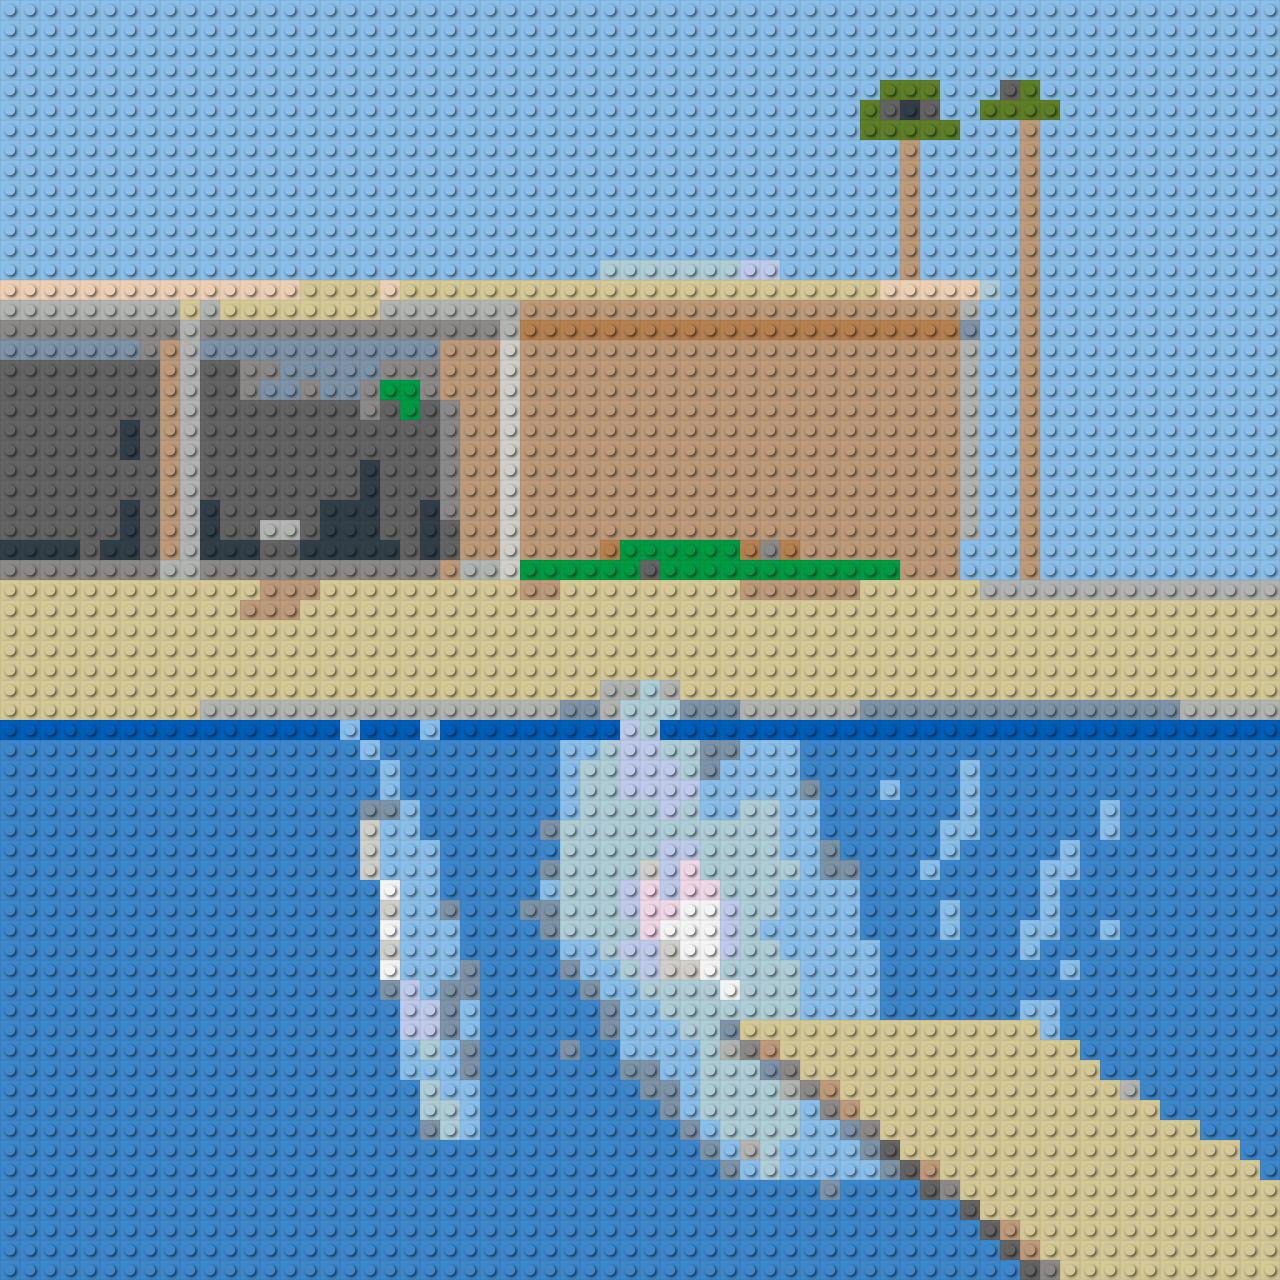 A smaller splash in Lego